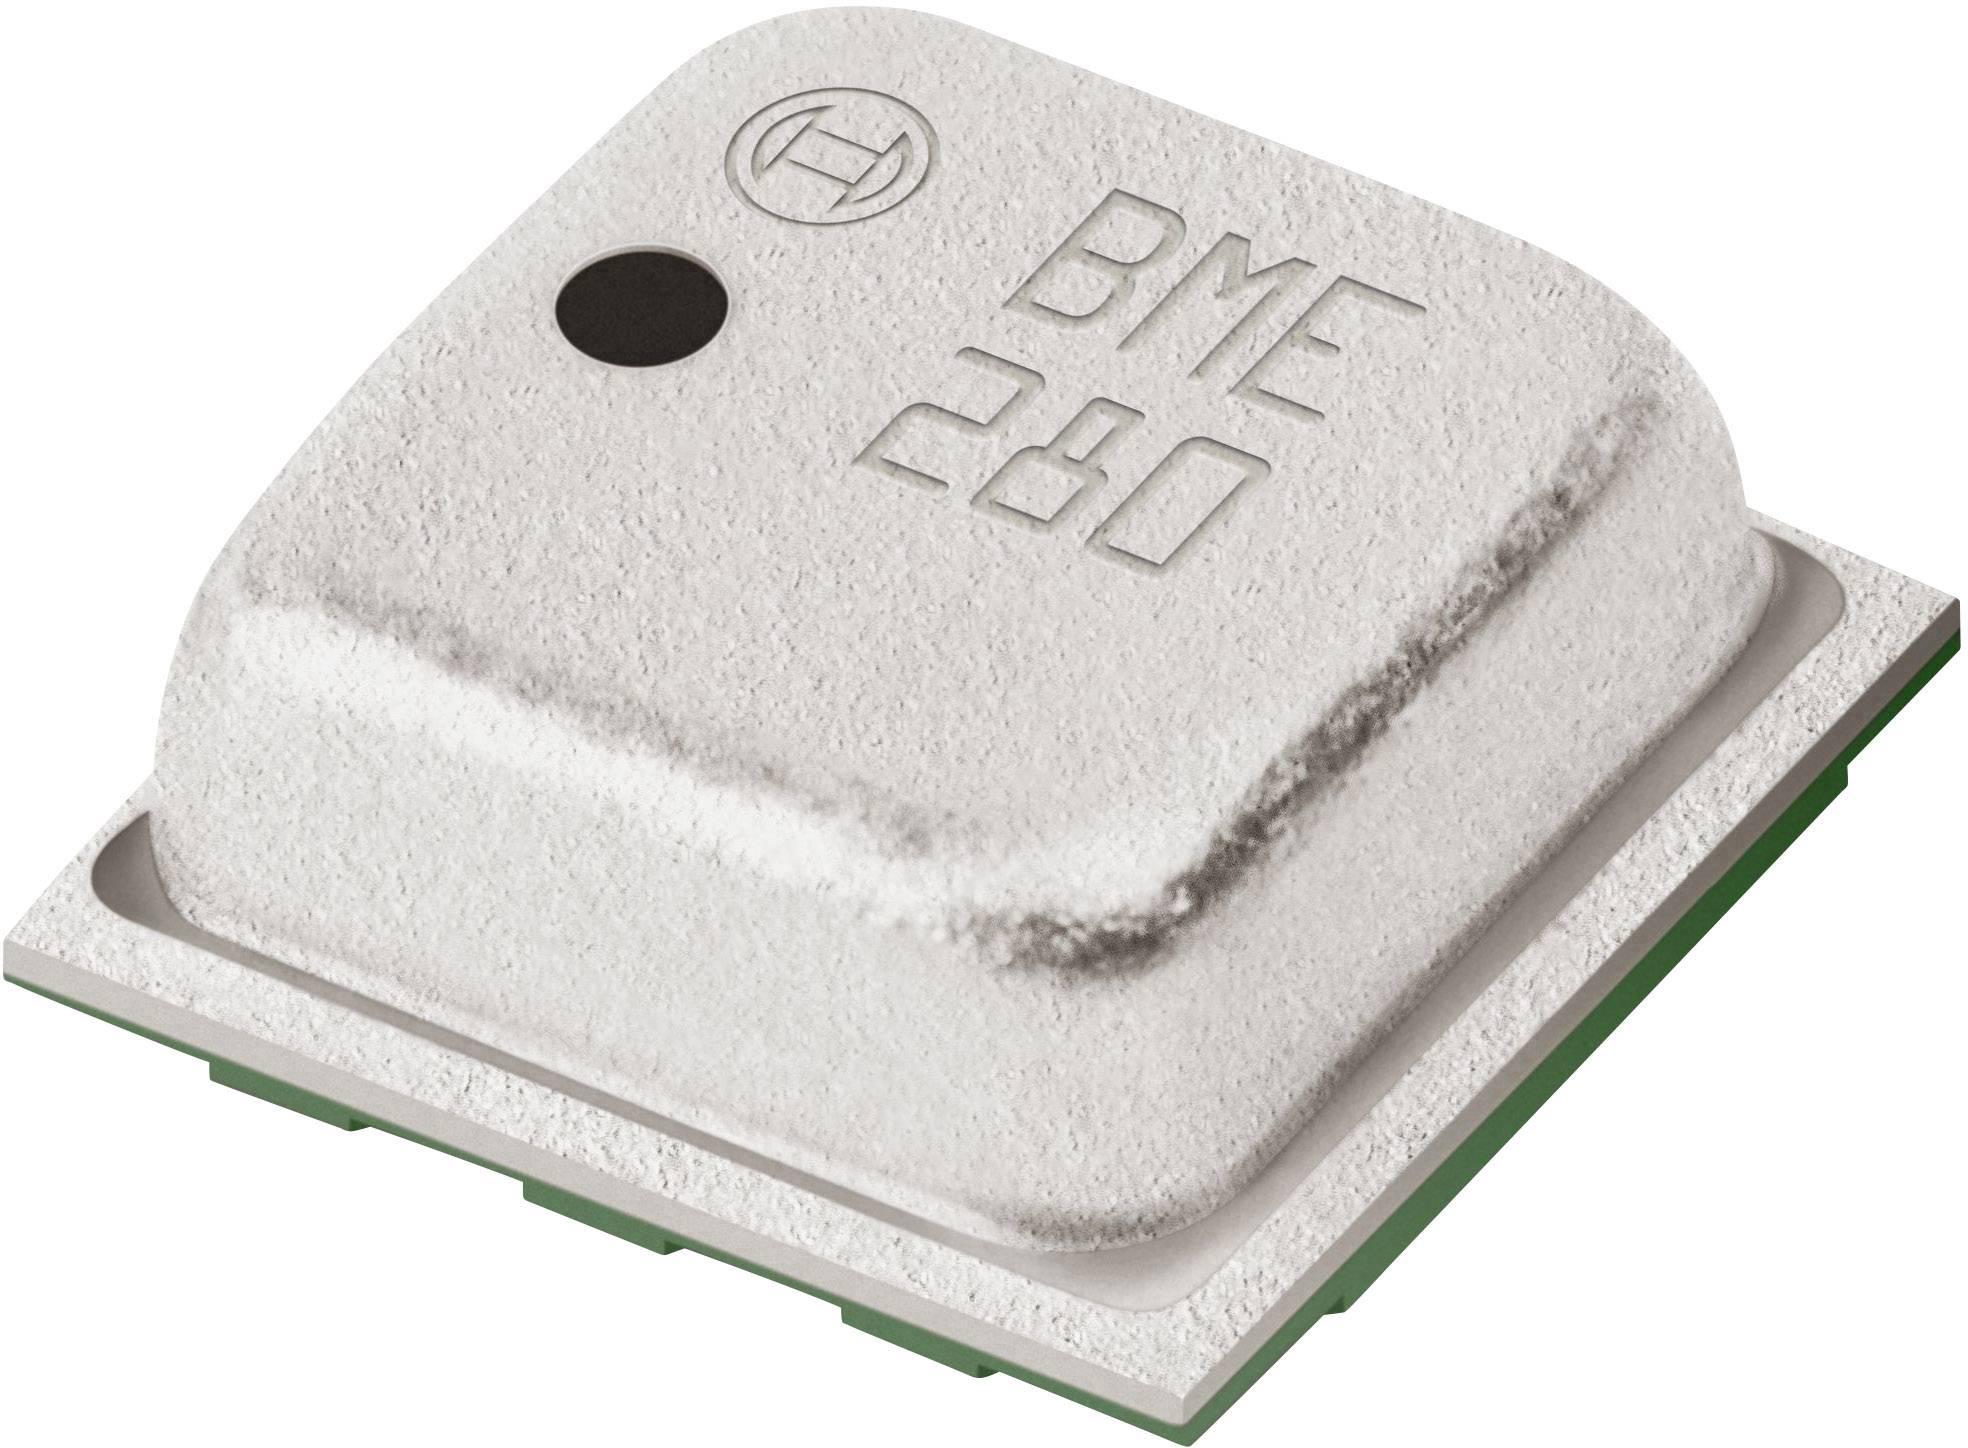 Senzor tlaku Bosch 0273.141.185-1NV, 300 hPa do 1100 hPa